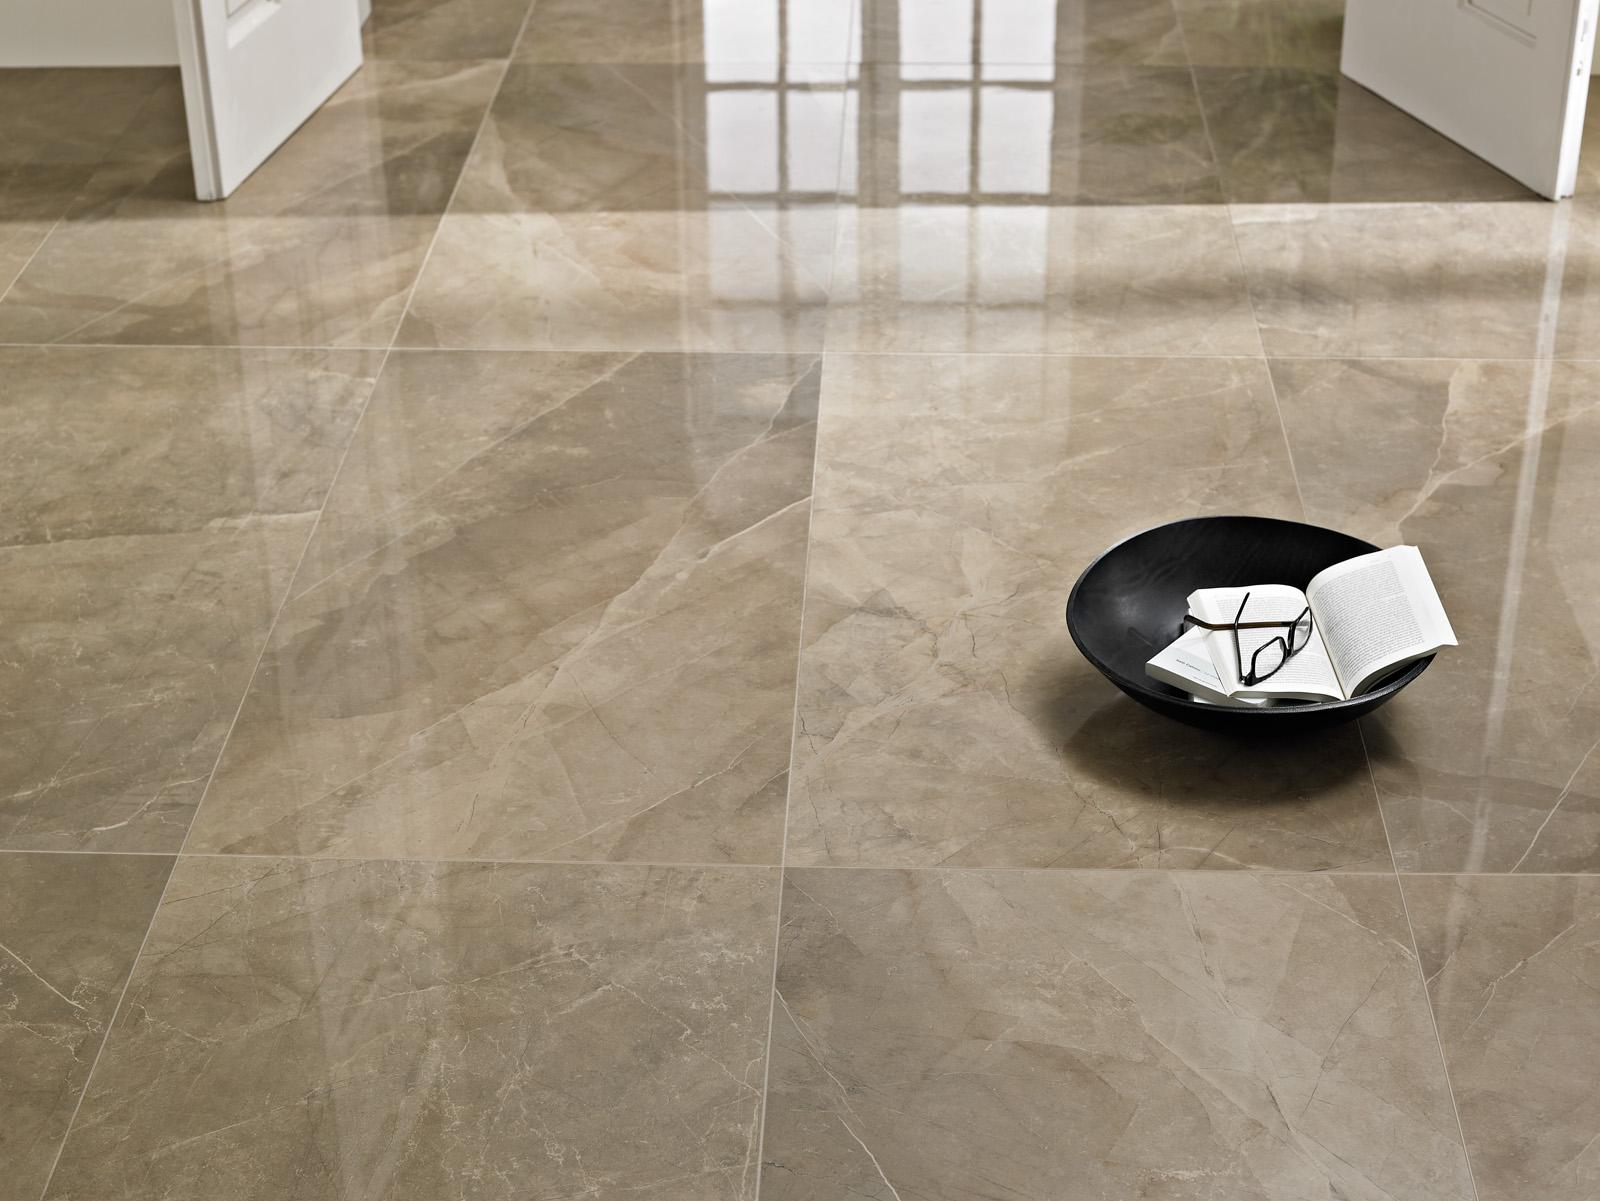 EvolutionMarble Feinsteinzeug In Marmoroptik Marazzi - Fliesen jura marmor optik